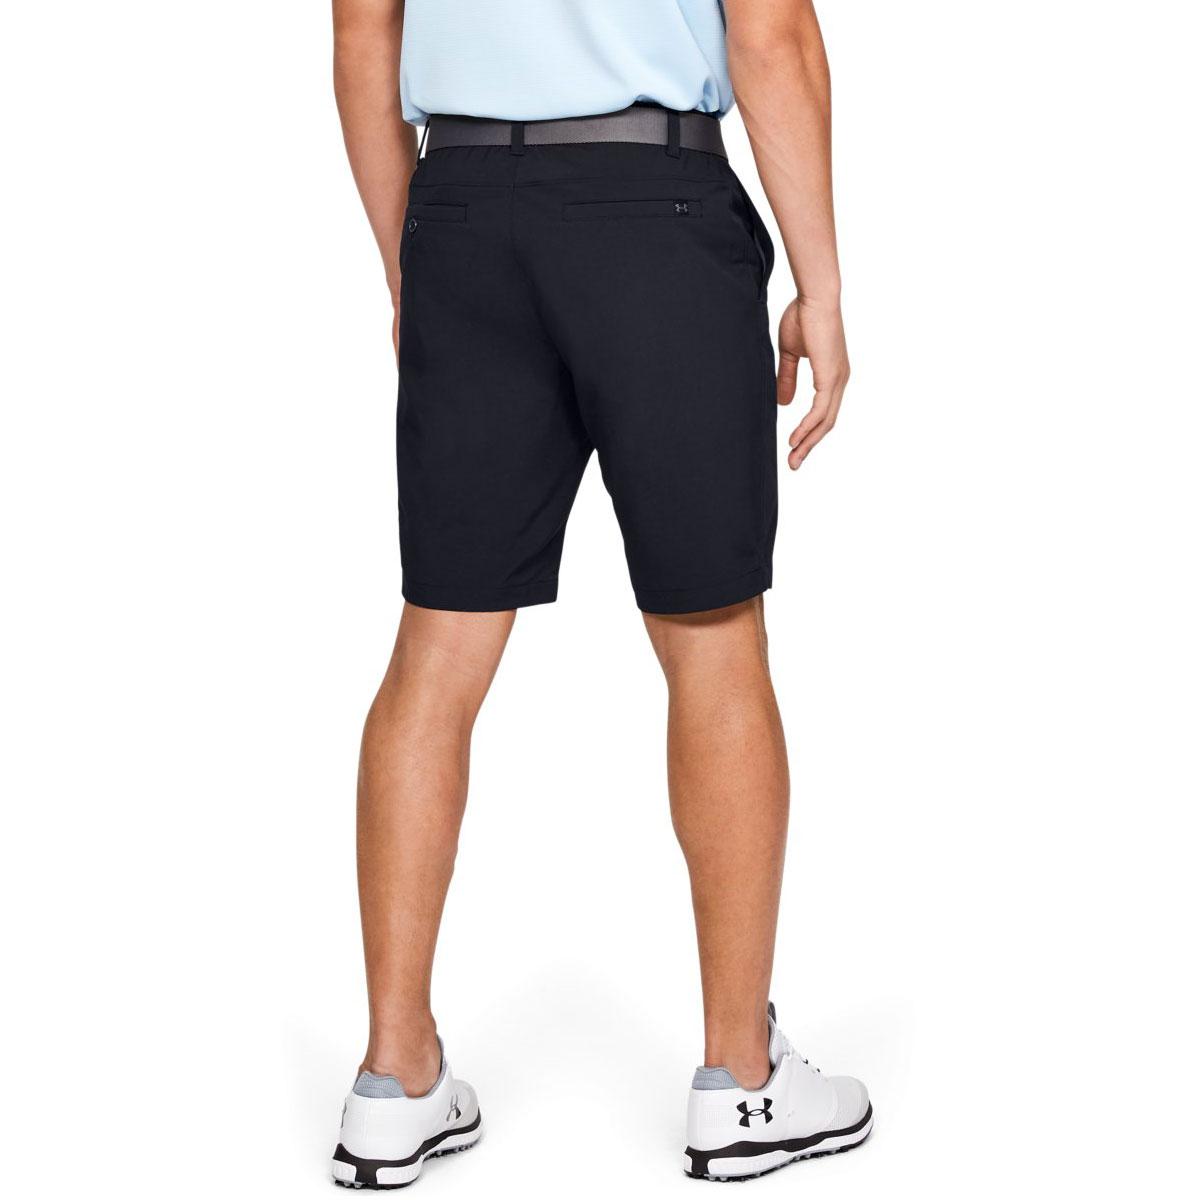 Under-Armour-Mens-2019-EU-Performance-Taper-Stretch-Soft-Comfort-Golf-Shorts thumbnail 5